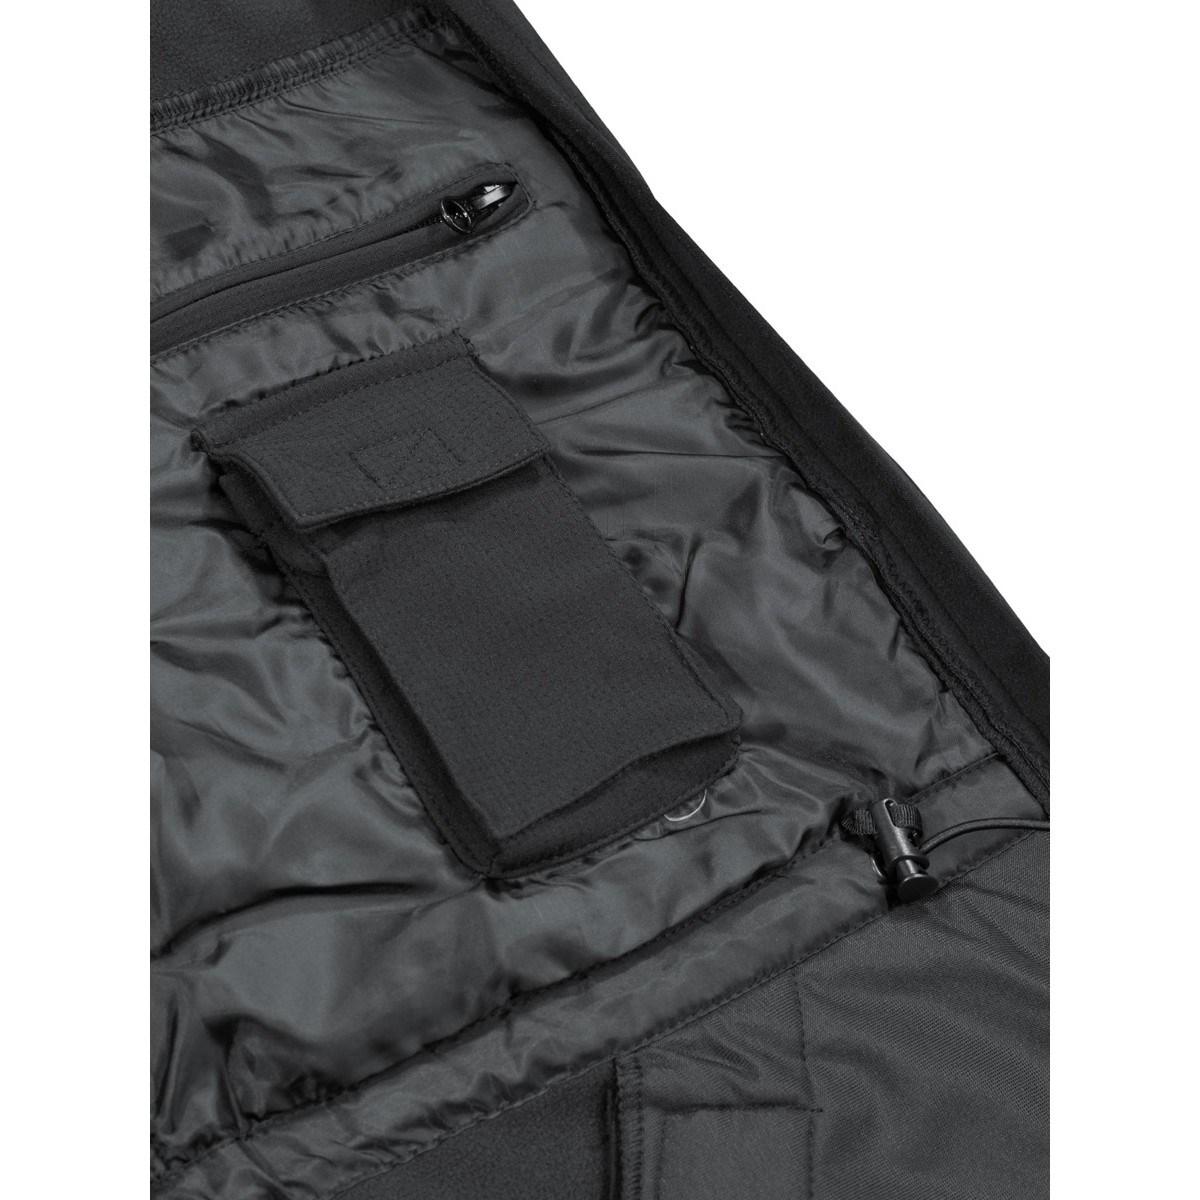 Bunda softshell HIGH DEFENCE ČERNÁ MFH Defence 03411A L-11